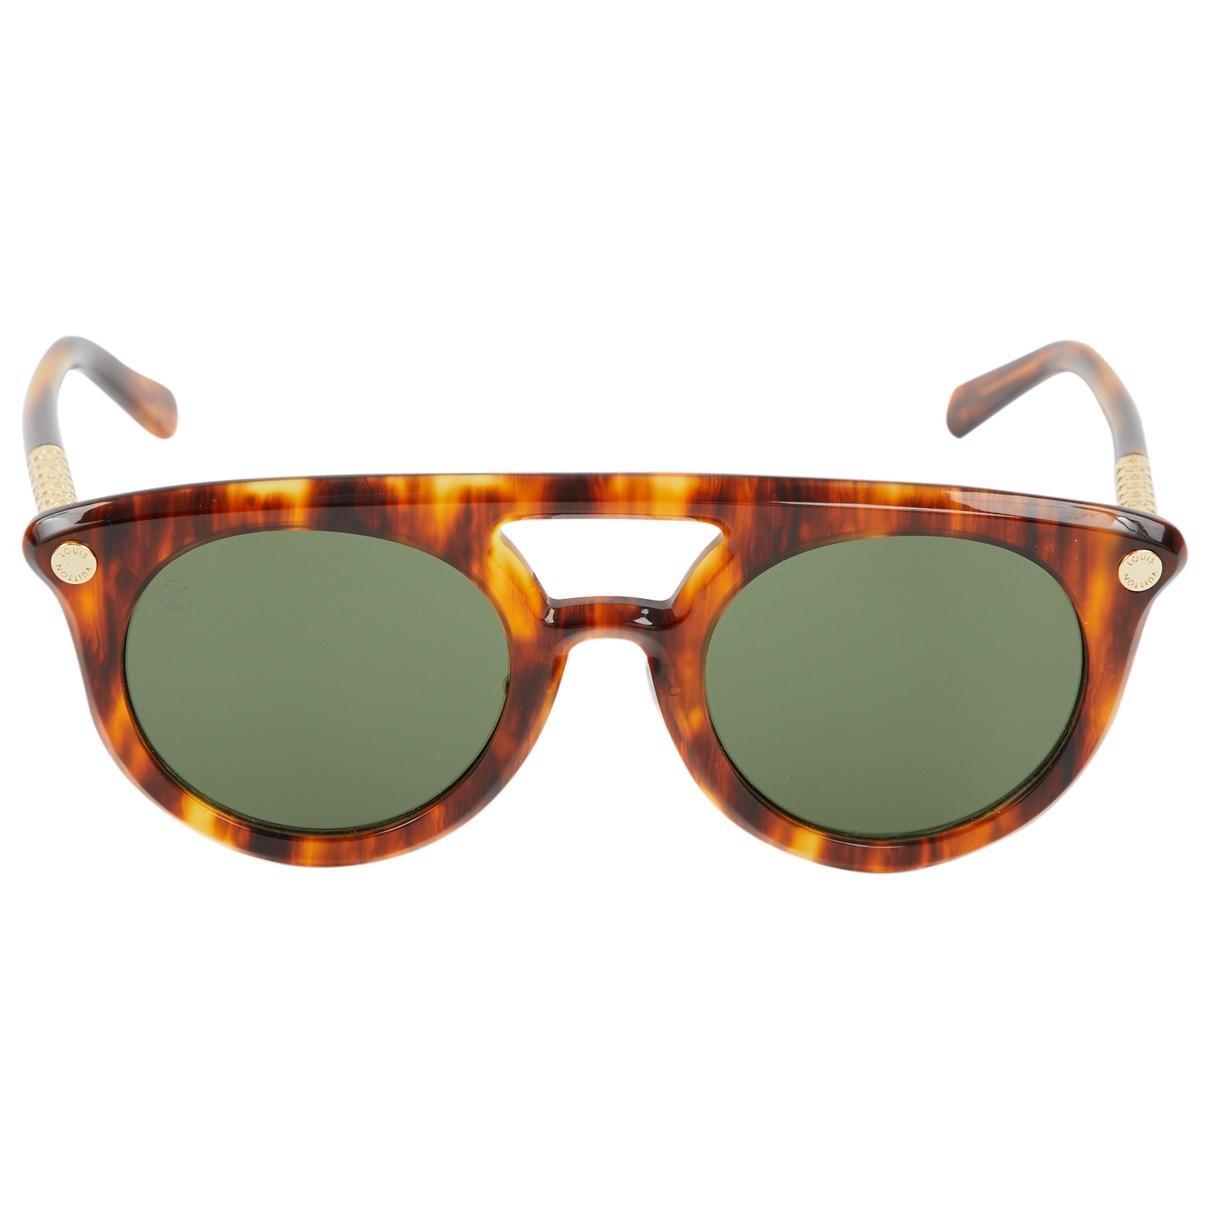 dc4dd5b4ede0 Louis Vuitton Aviator Sunglasses in Brown - Lyst